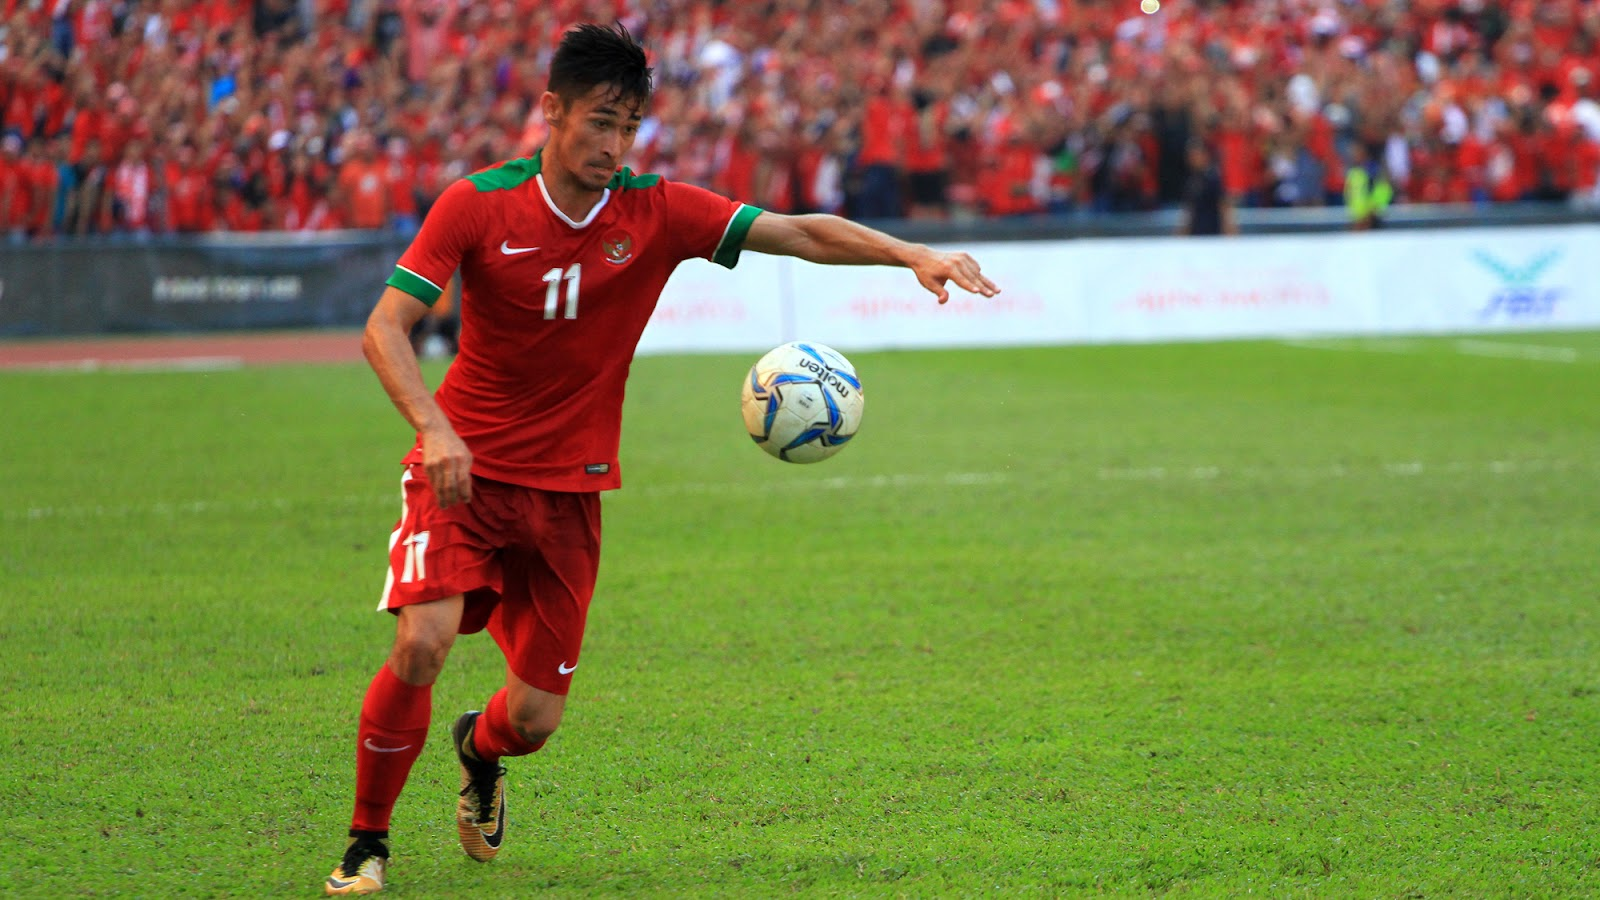 Gavin Kwan Adsit on the ball for timnas Indonesia